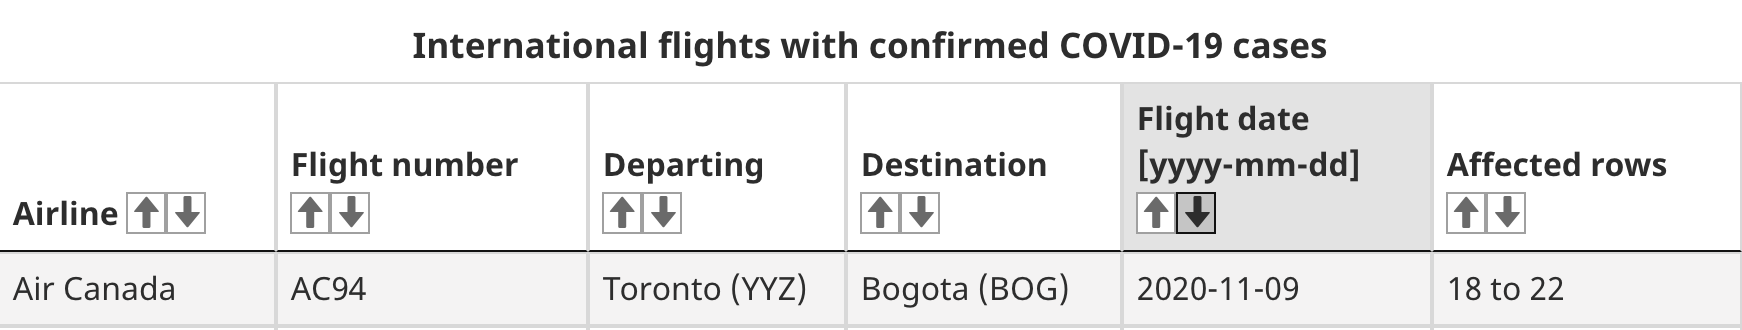 covid-19 flights